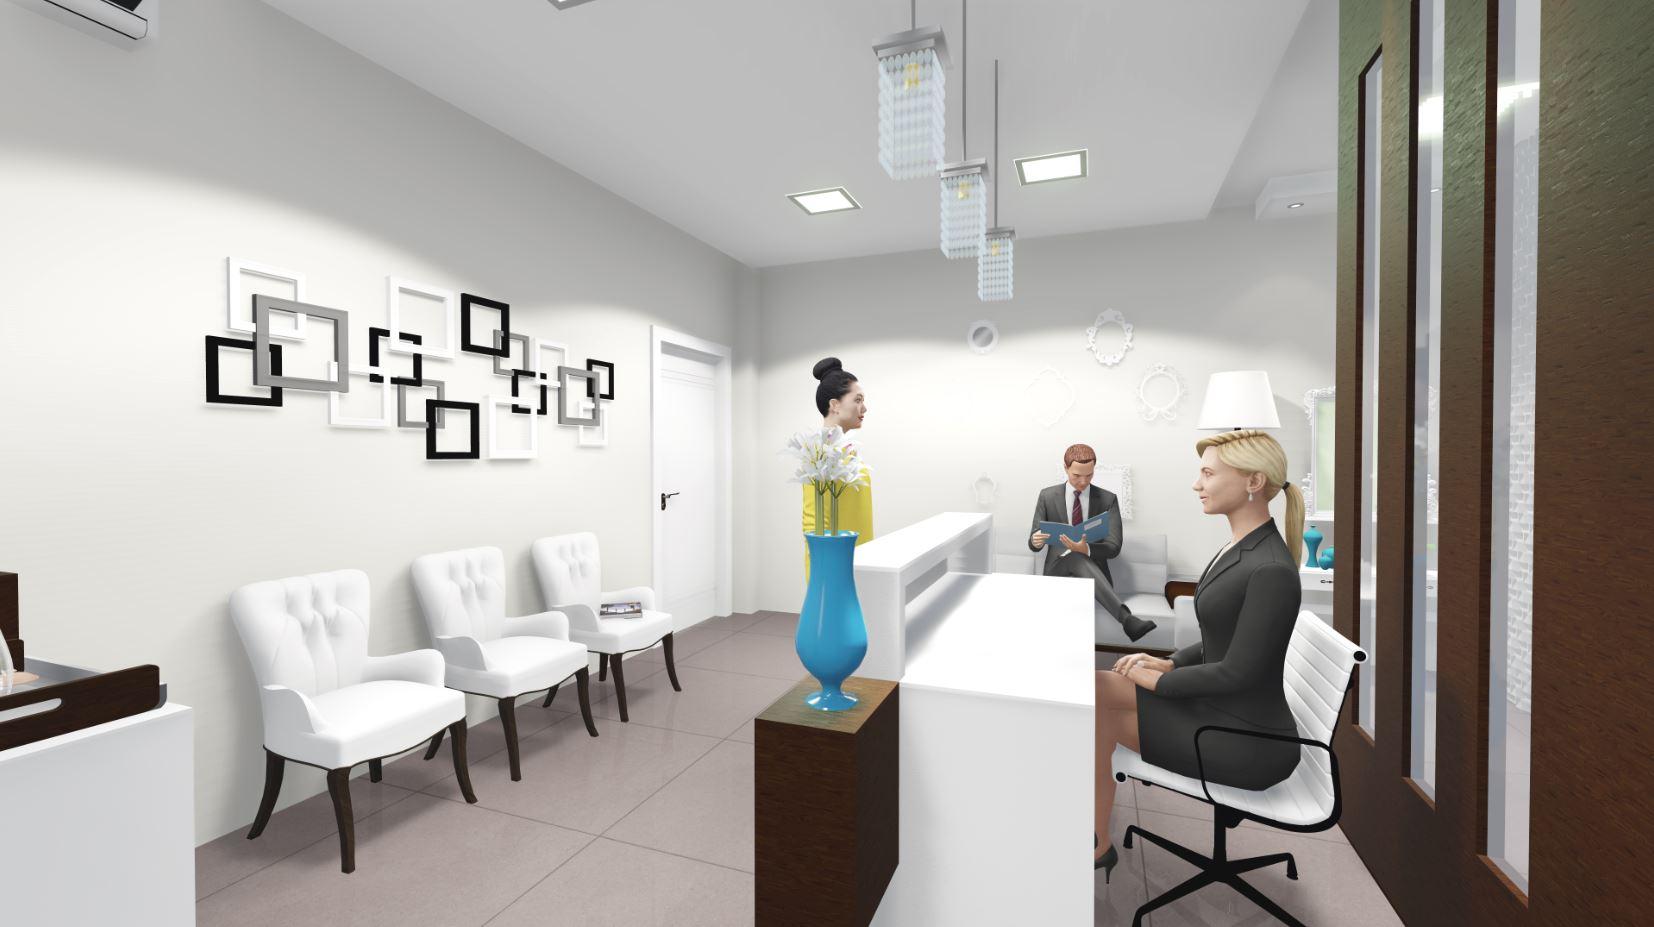 Interiores - Corporativo